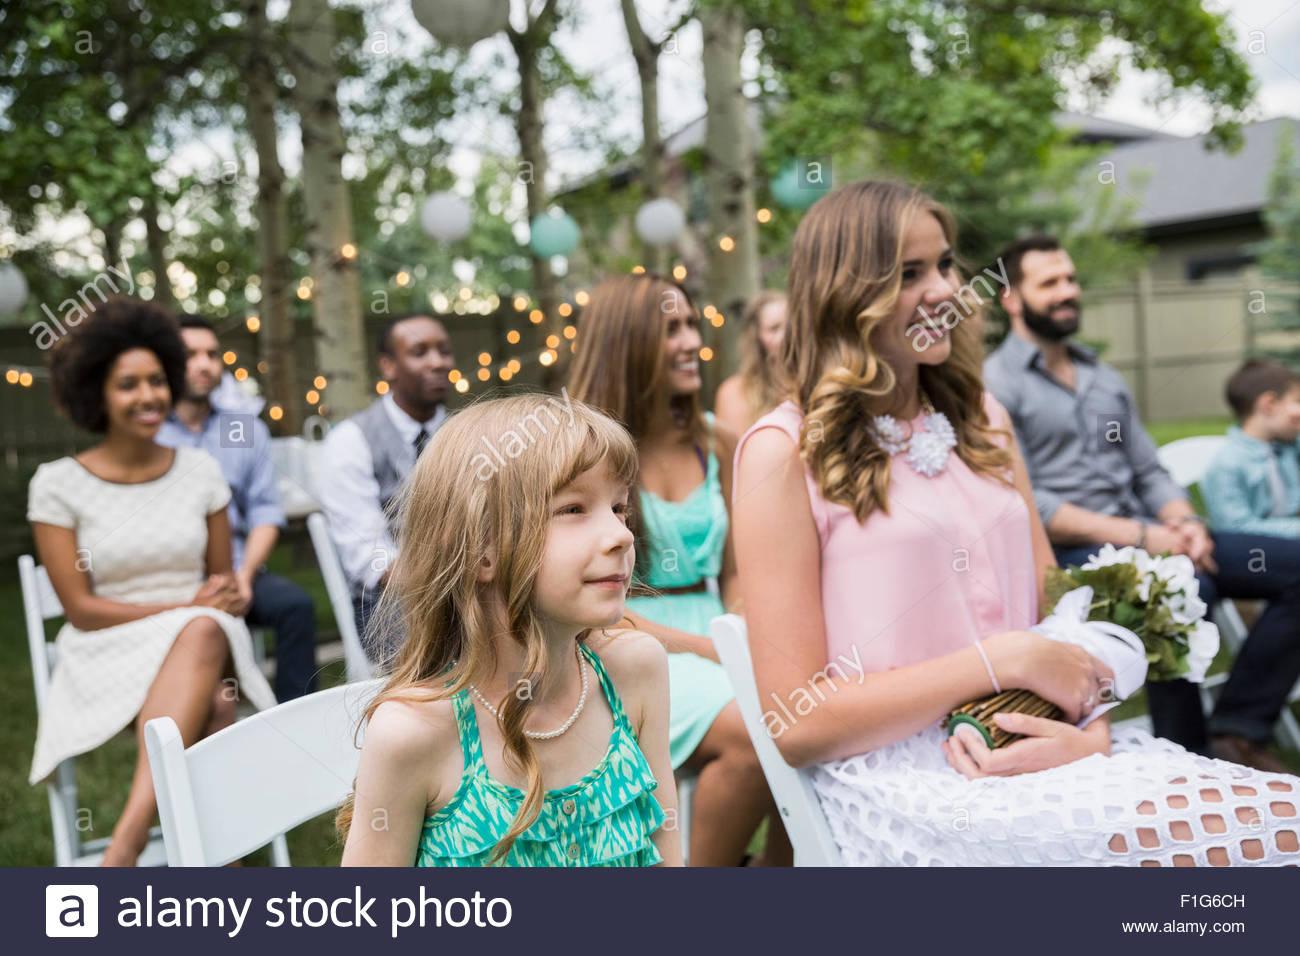 Smiling wedding guests enjoying backyard wedding Stock Photo